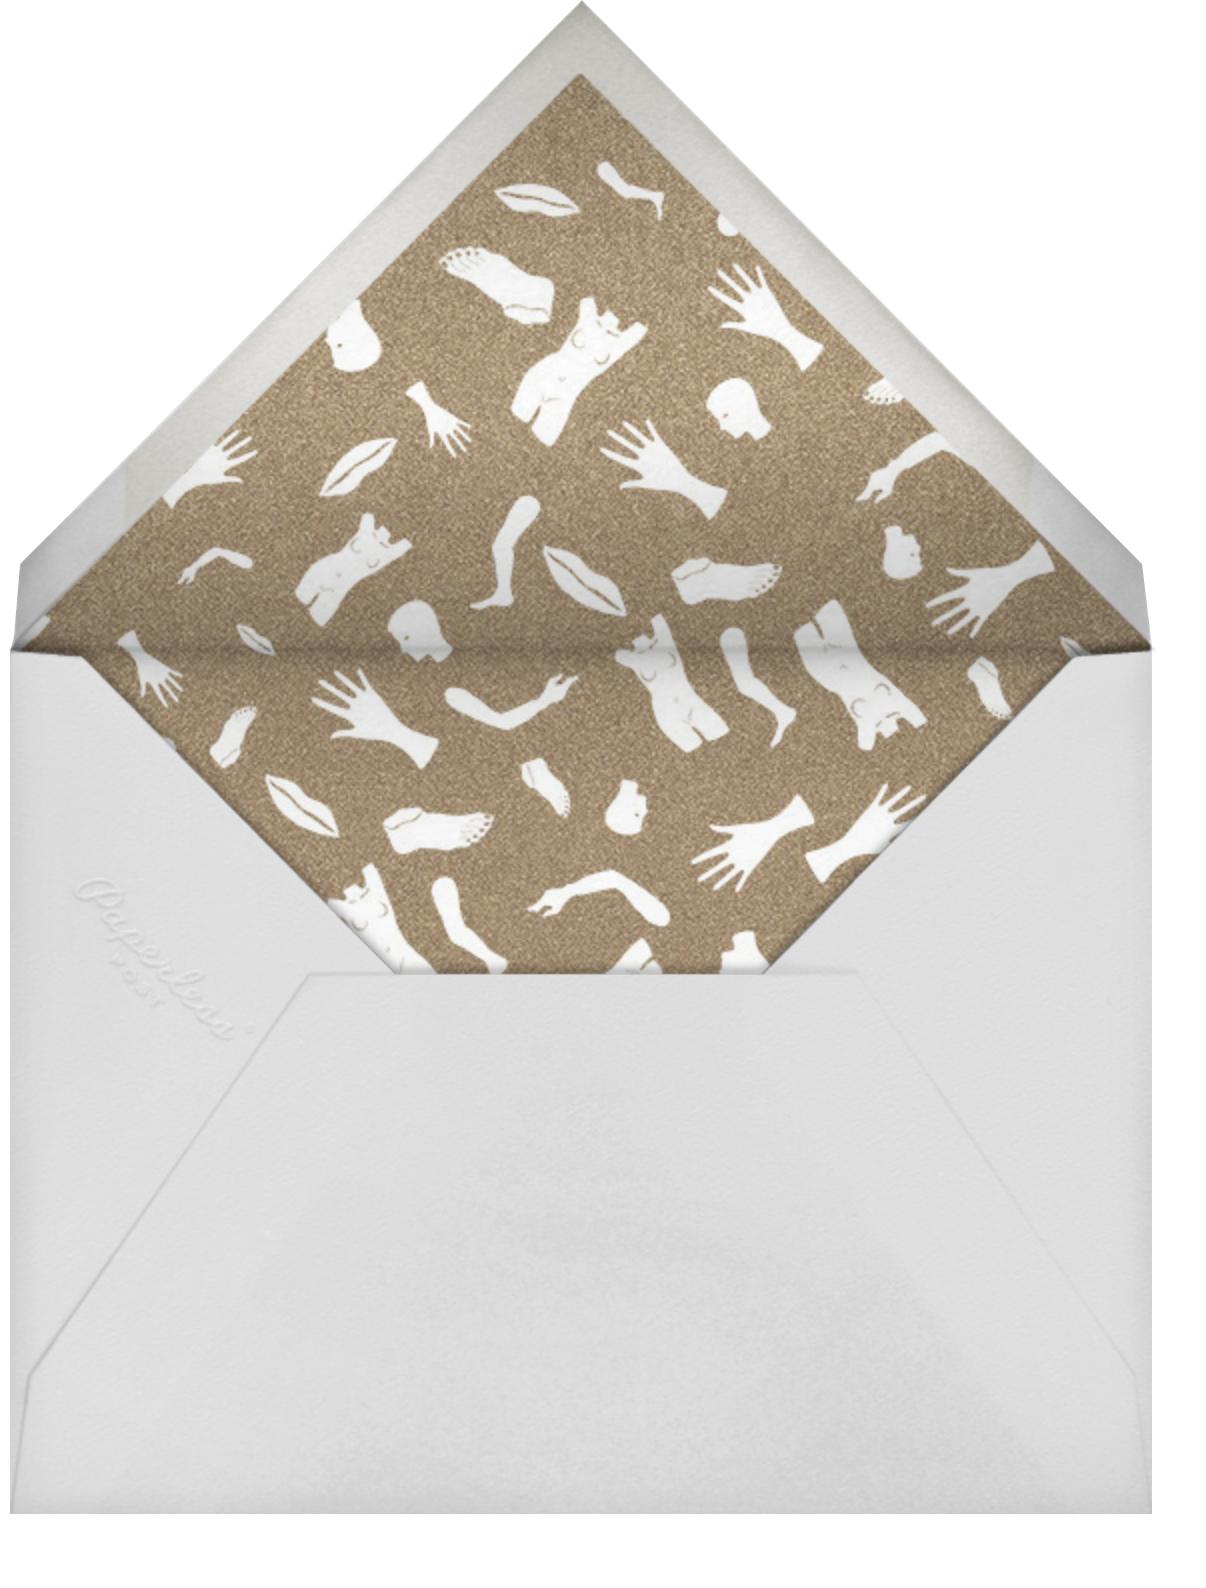 Sugar - Kelly Wearstler - Cocktail party - envelope back